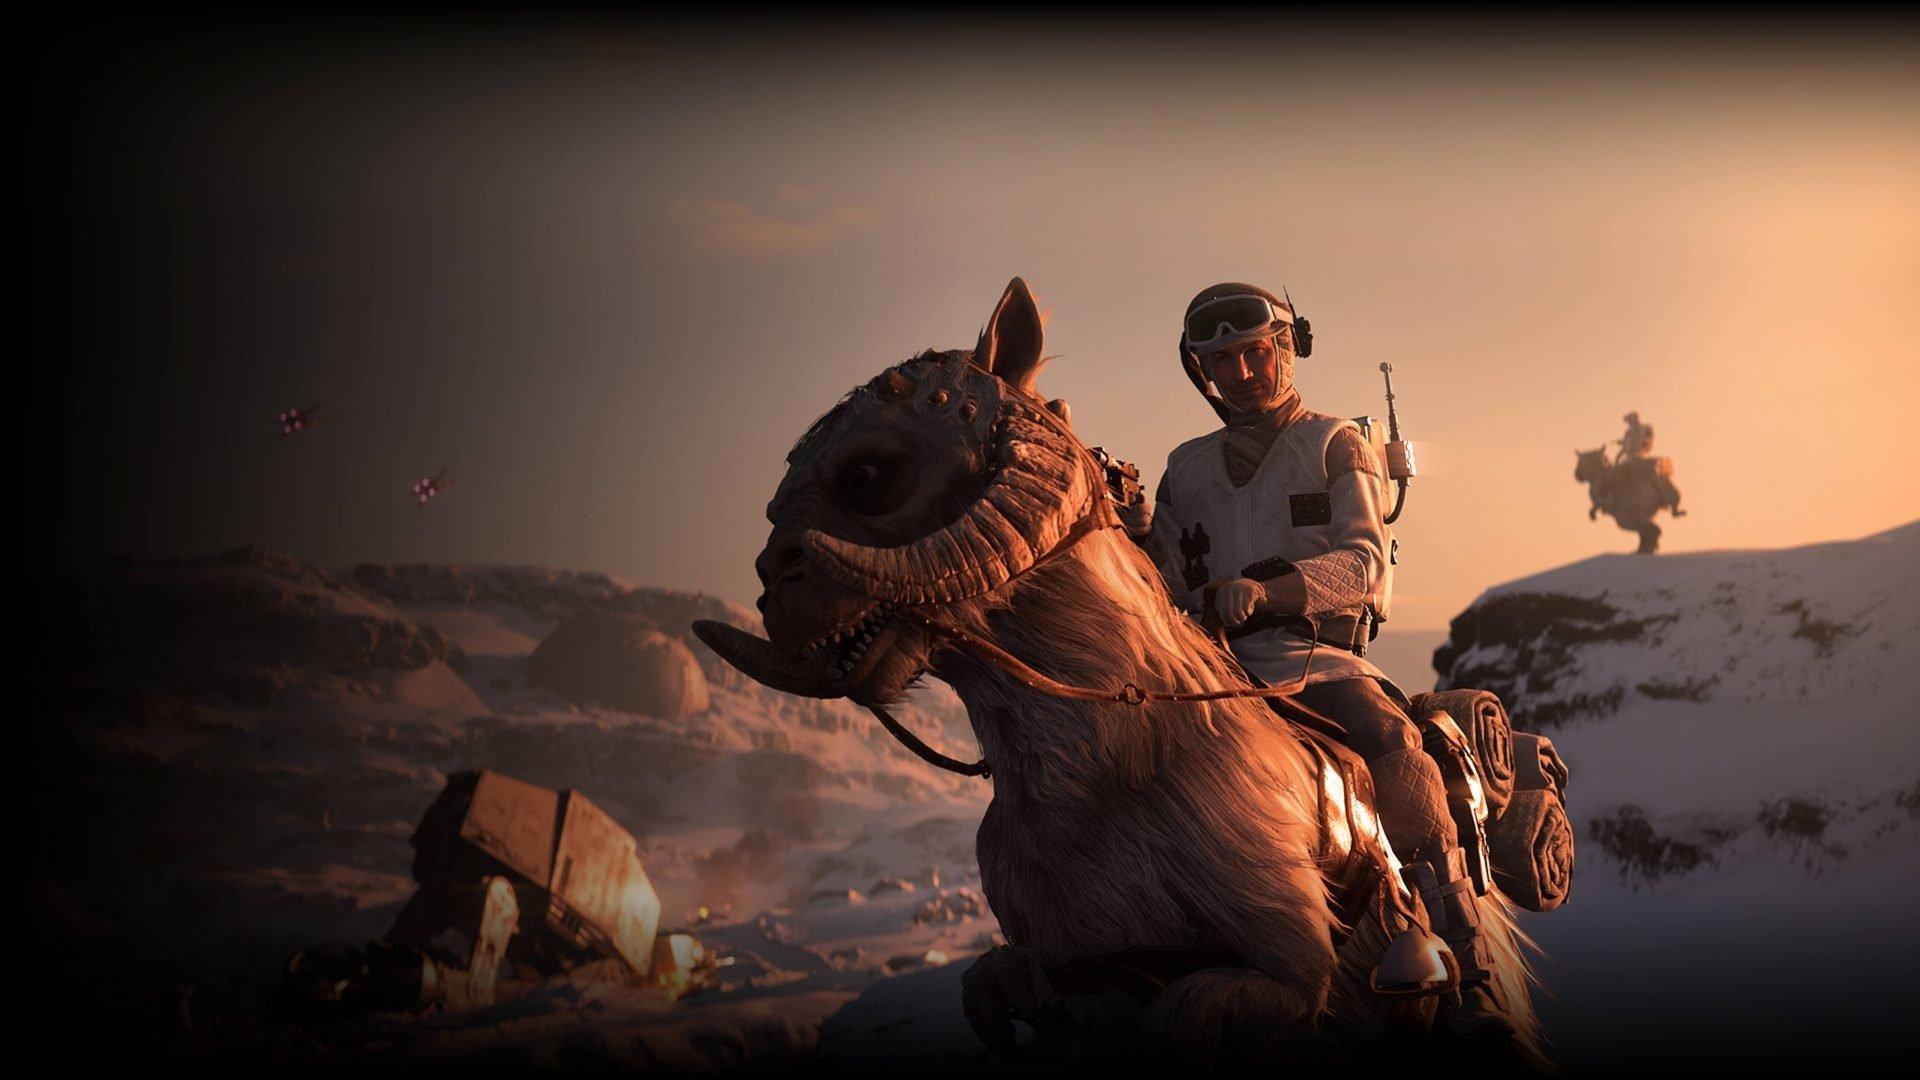 Star Wars Battlefront 2 Background: Save Star Wars Battlefront II HD Wallpapers